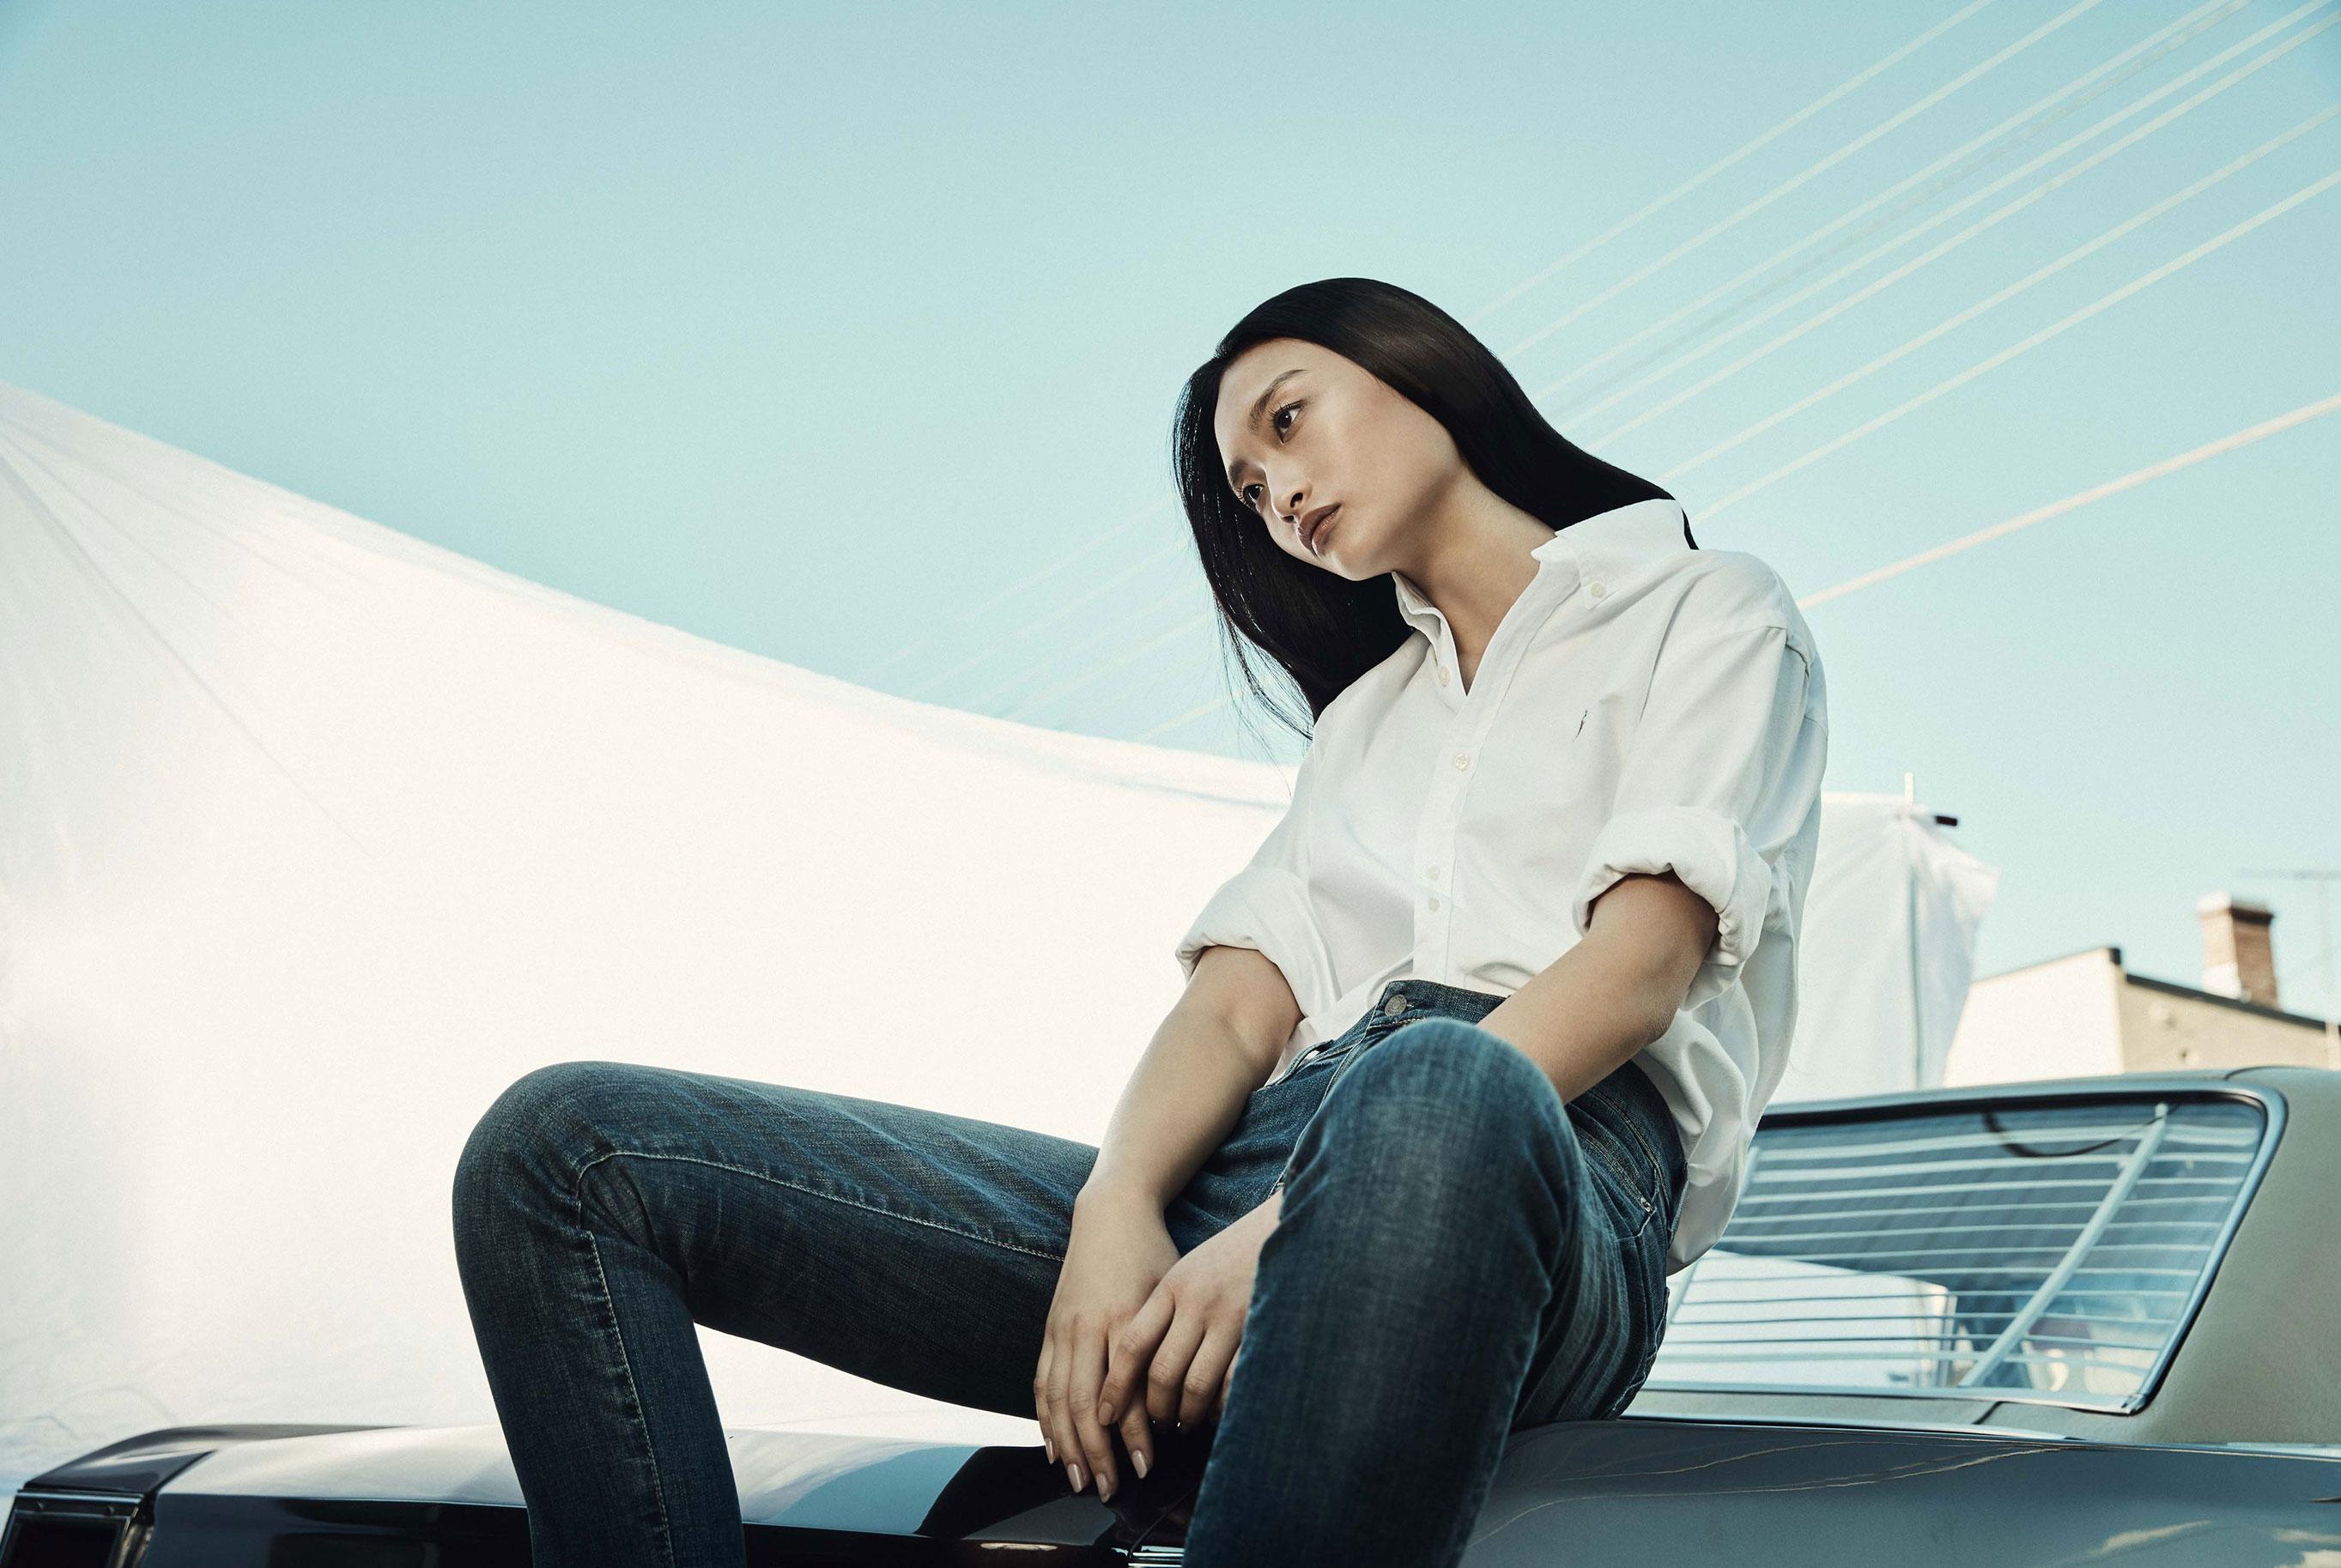 Случай на парковке - как найти принца / Rowena Xi Kang by Steven Popovich / grazia australia summer 2018